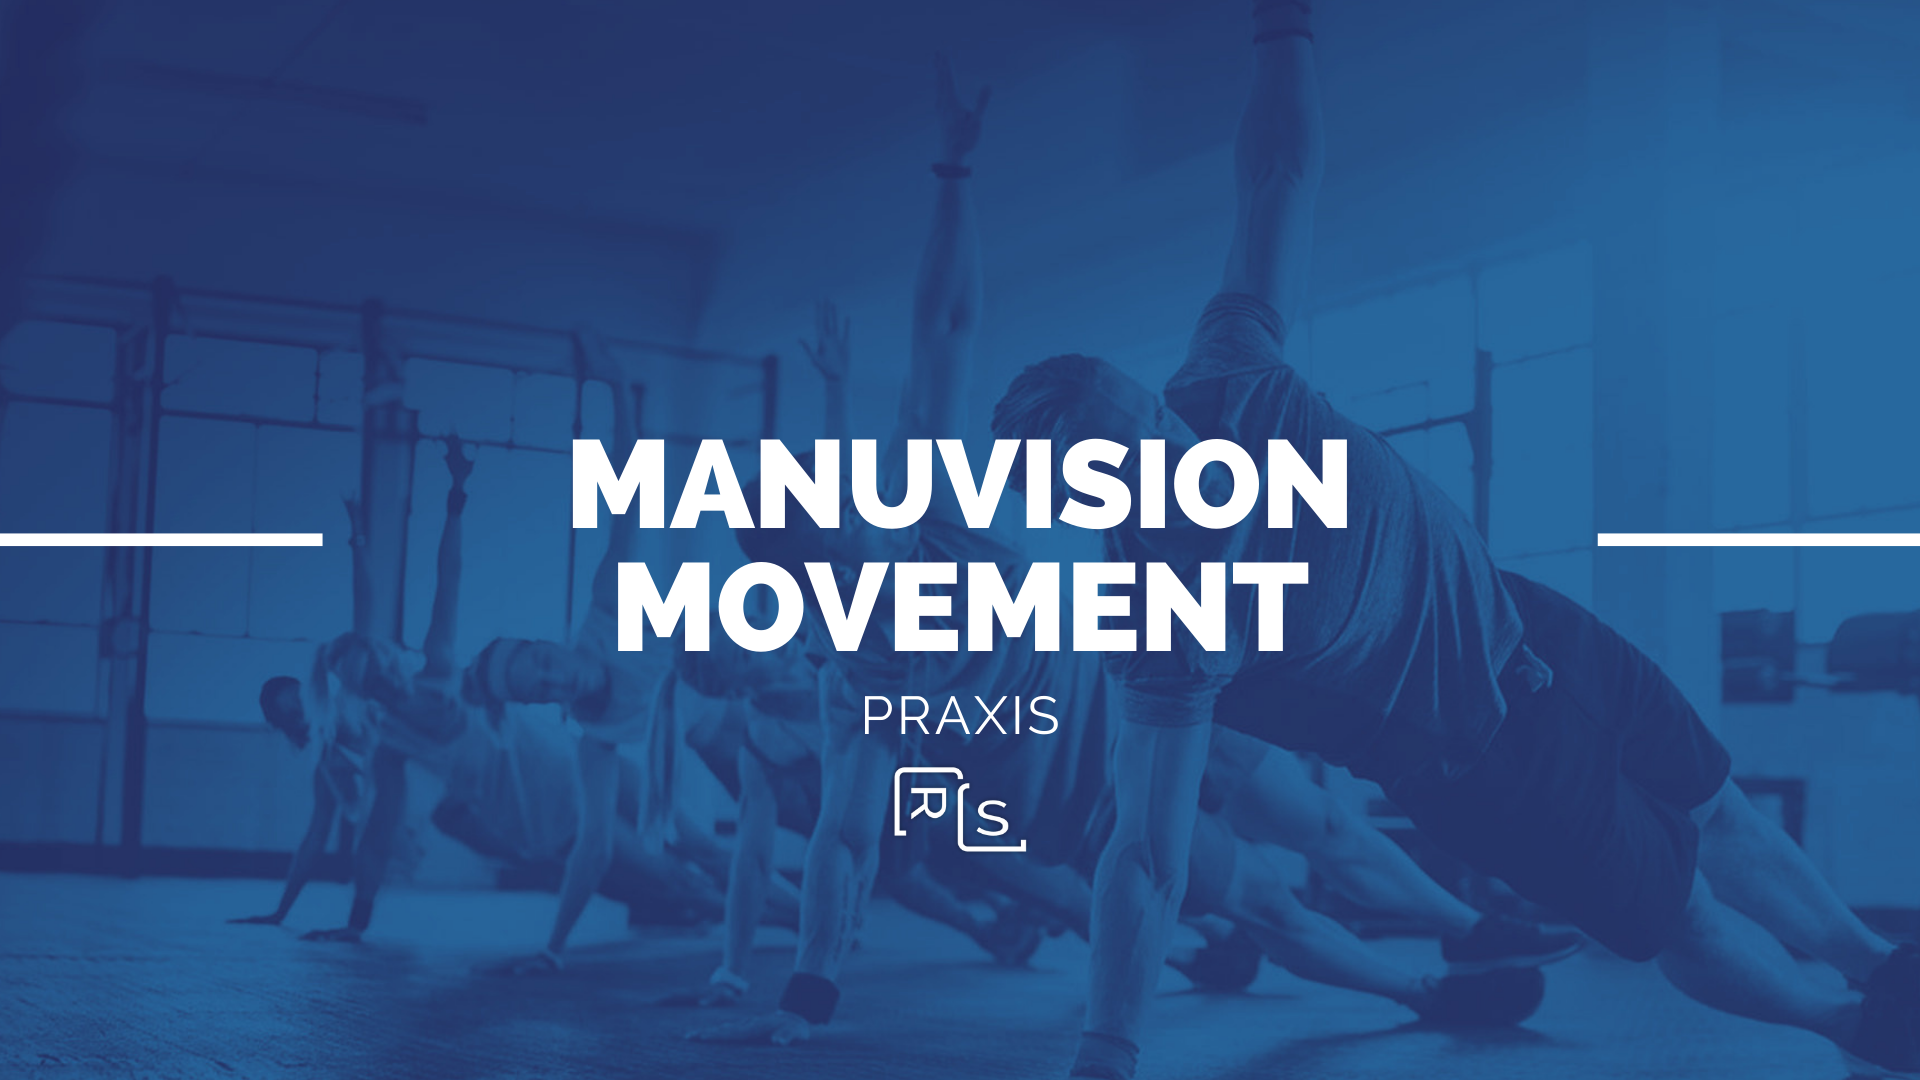 ManuVision Movement